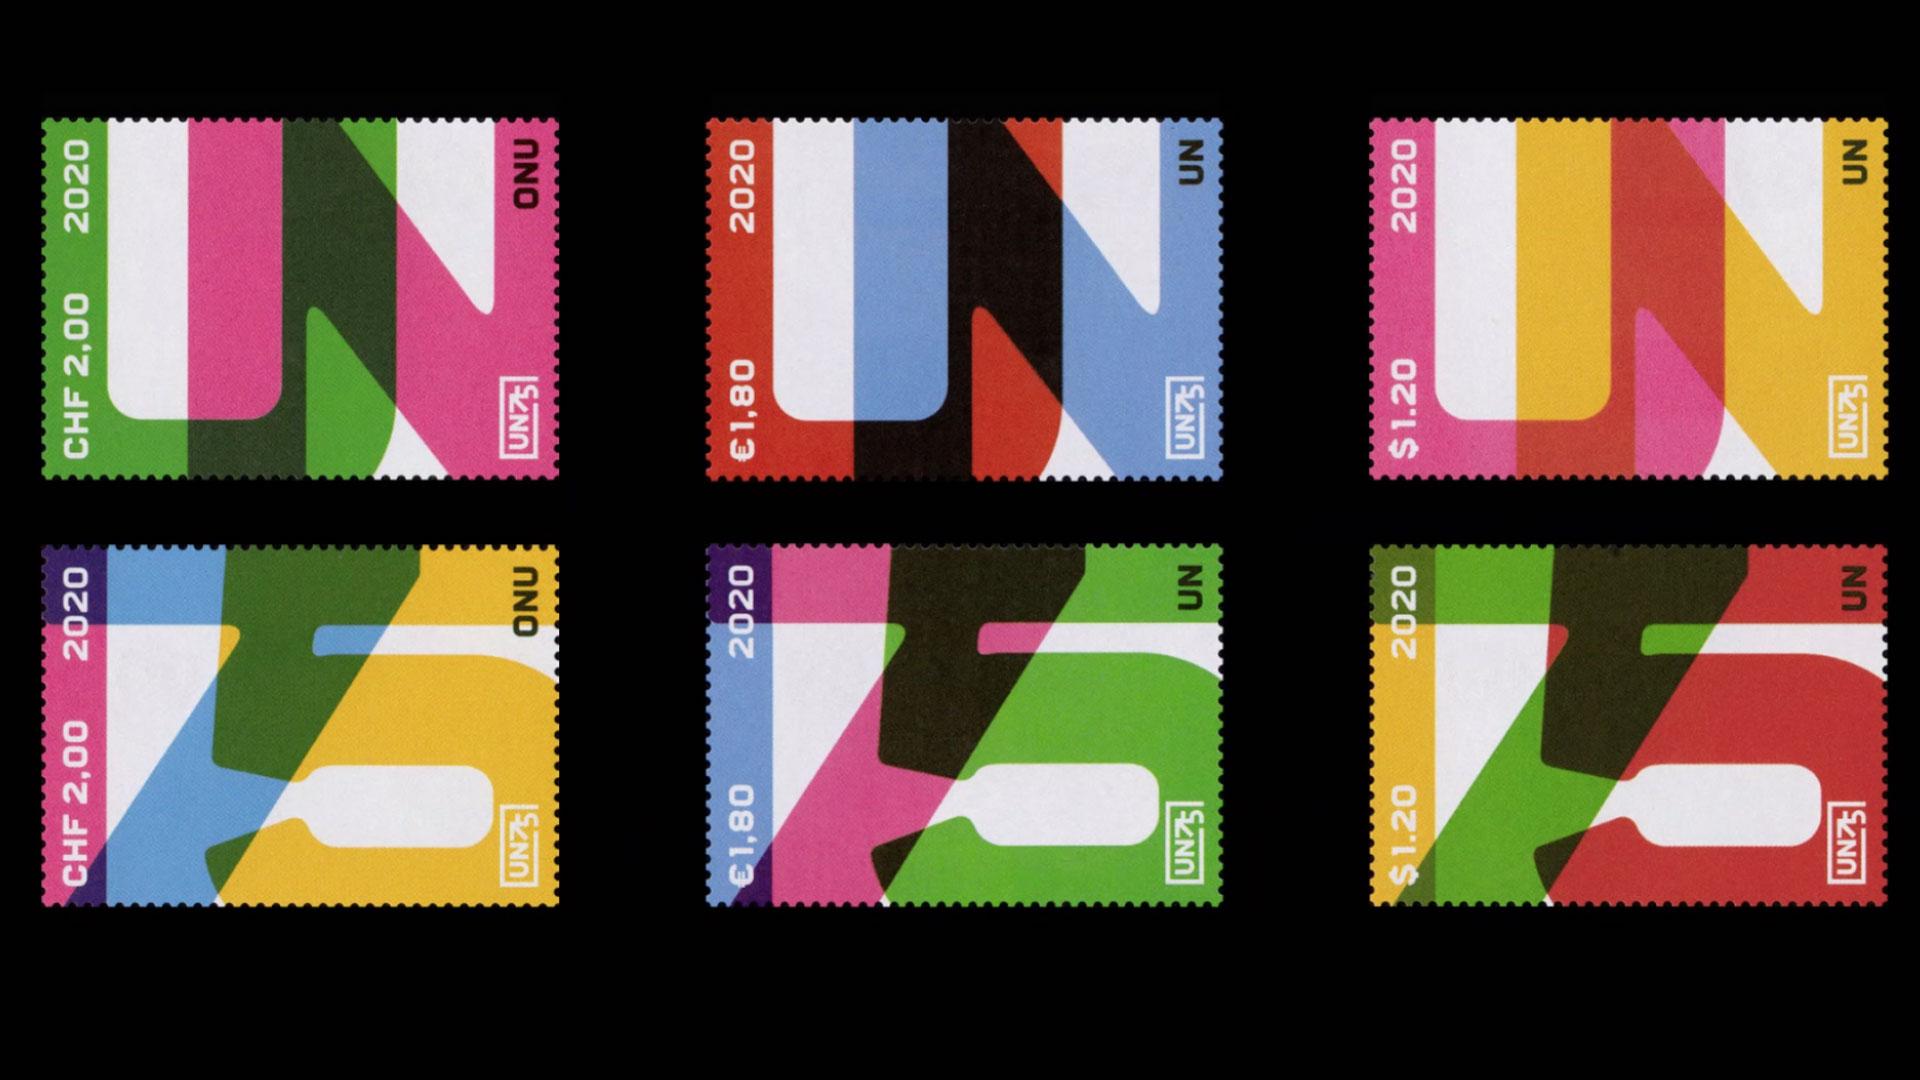 6 colorful UN stamps